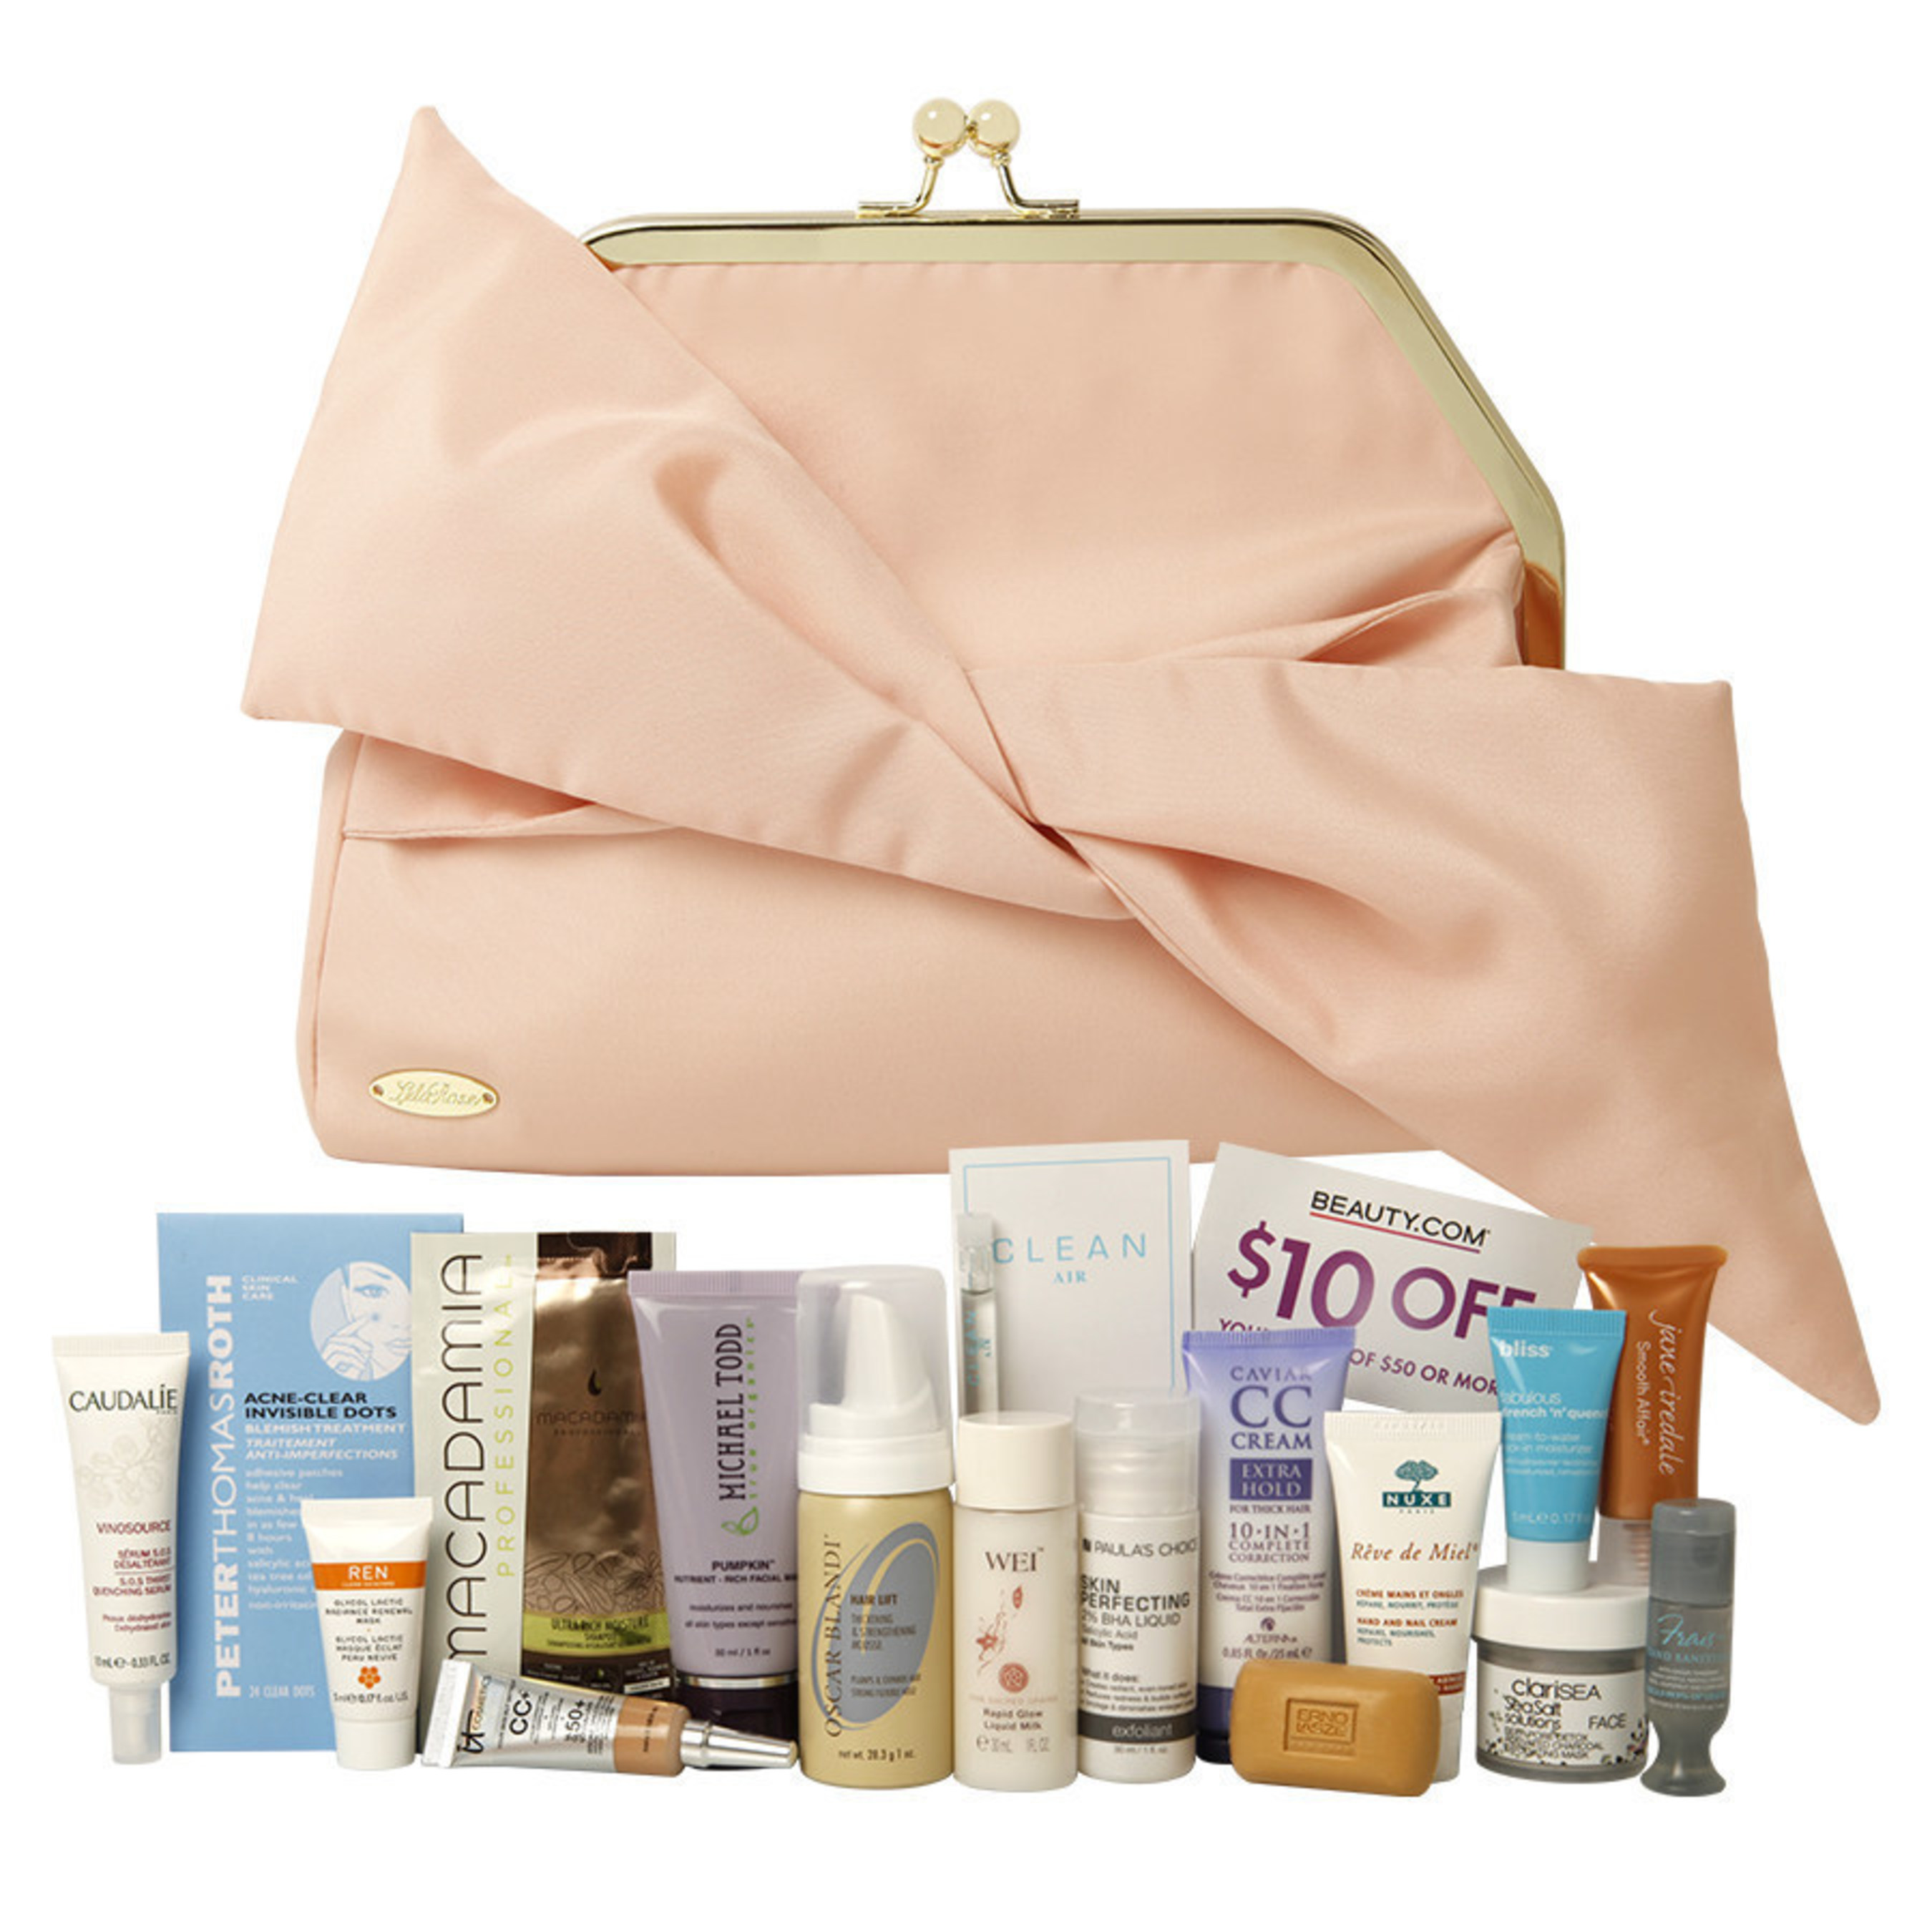 Beauty.com Exclusive Lela Rose Spring 2016 Cosmetic Bag